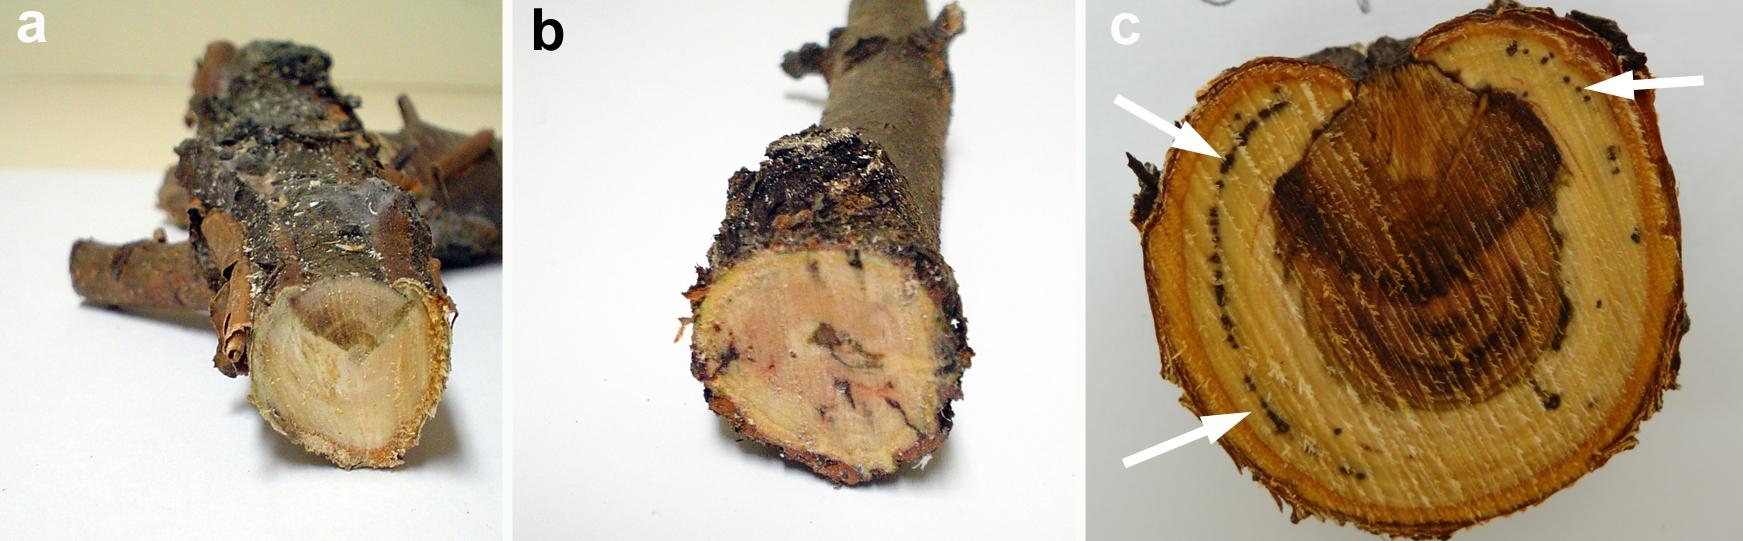 wingerd-stamsiekte-patogene-figuur-4